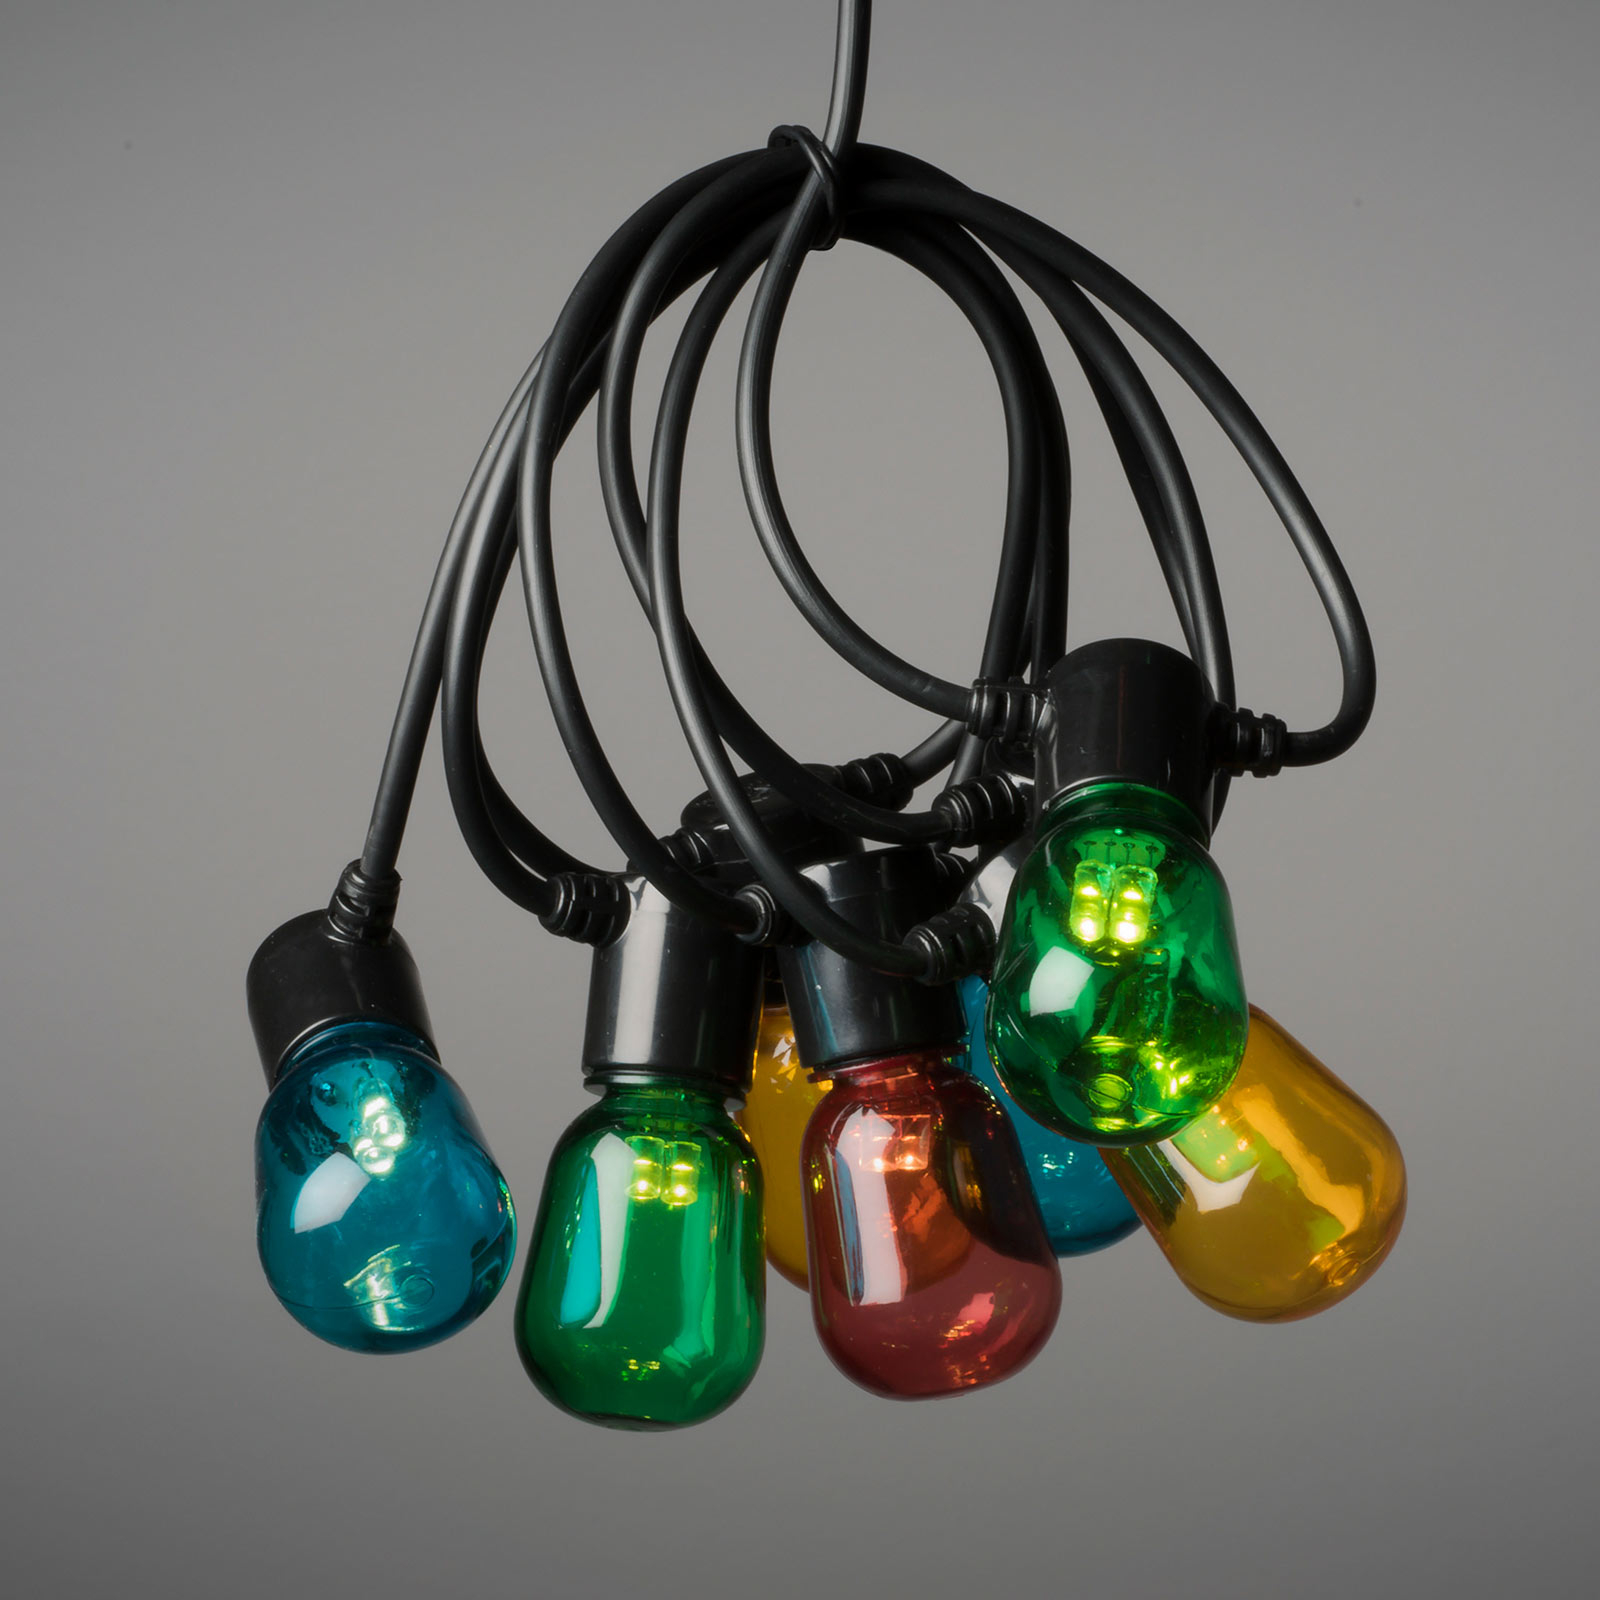 Catena luminosa LED Biergarten 40 luci colorate